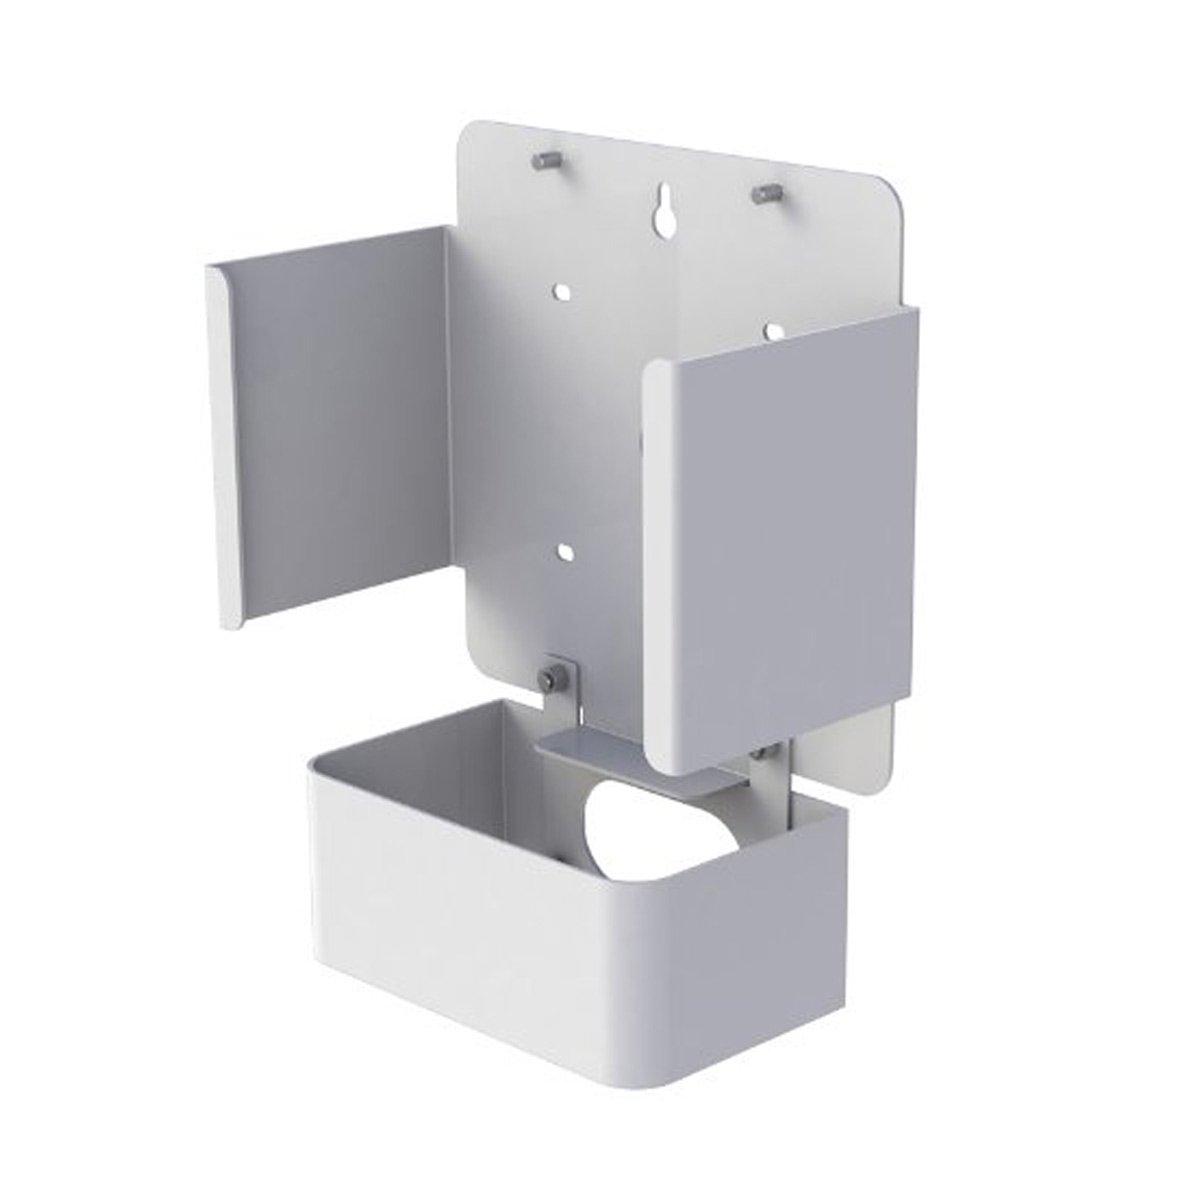 Flexson FLXCNWM1012 Wall Mount Bracket for Sonos Connect in White   B06XRHG189